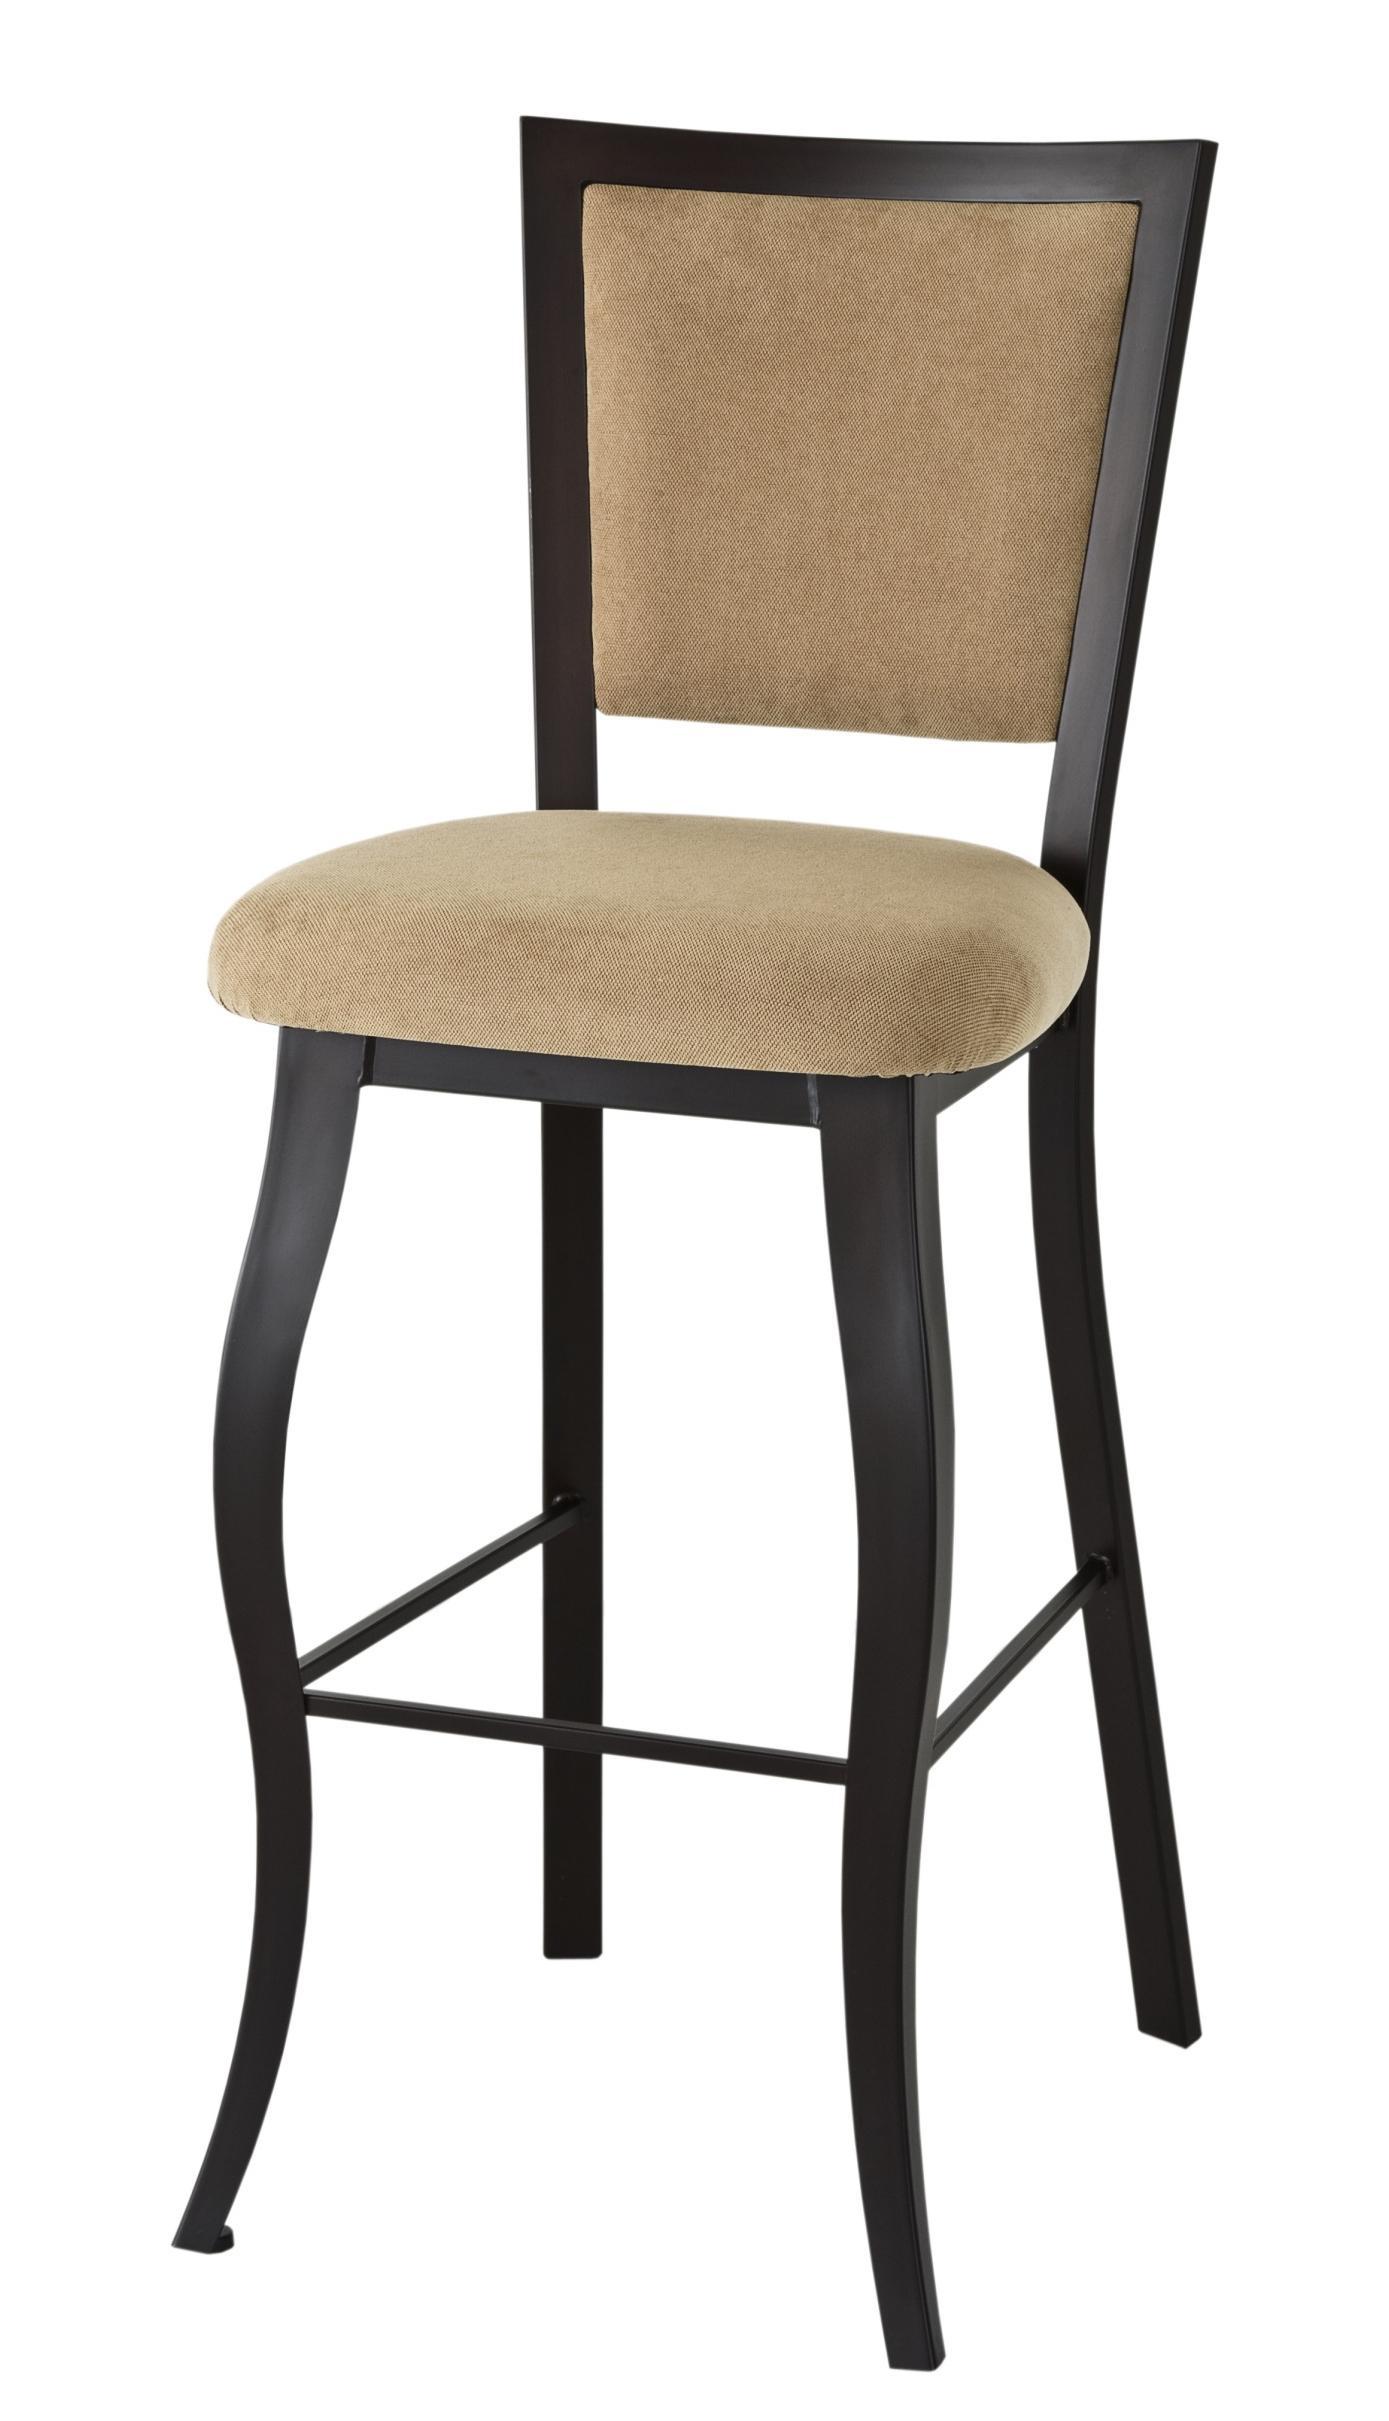 amisco stools juliet bar stool belfort furniture bar stools. Black Bedroom Furniture Sets. Home Design Ideas